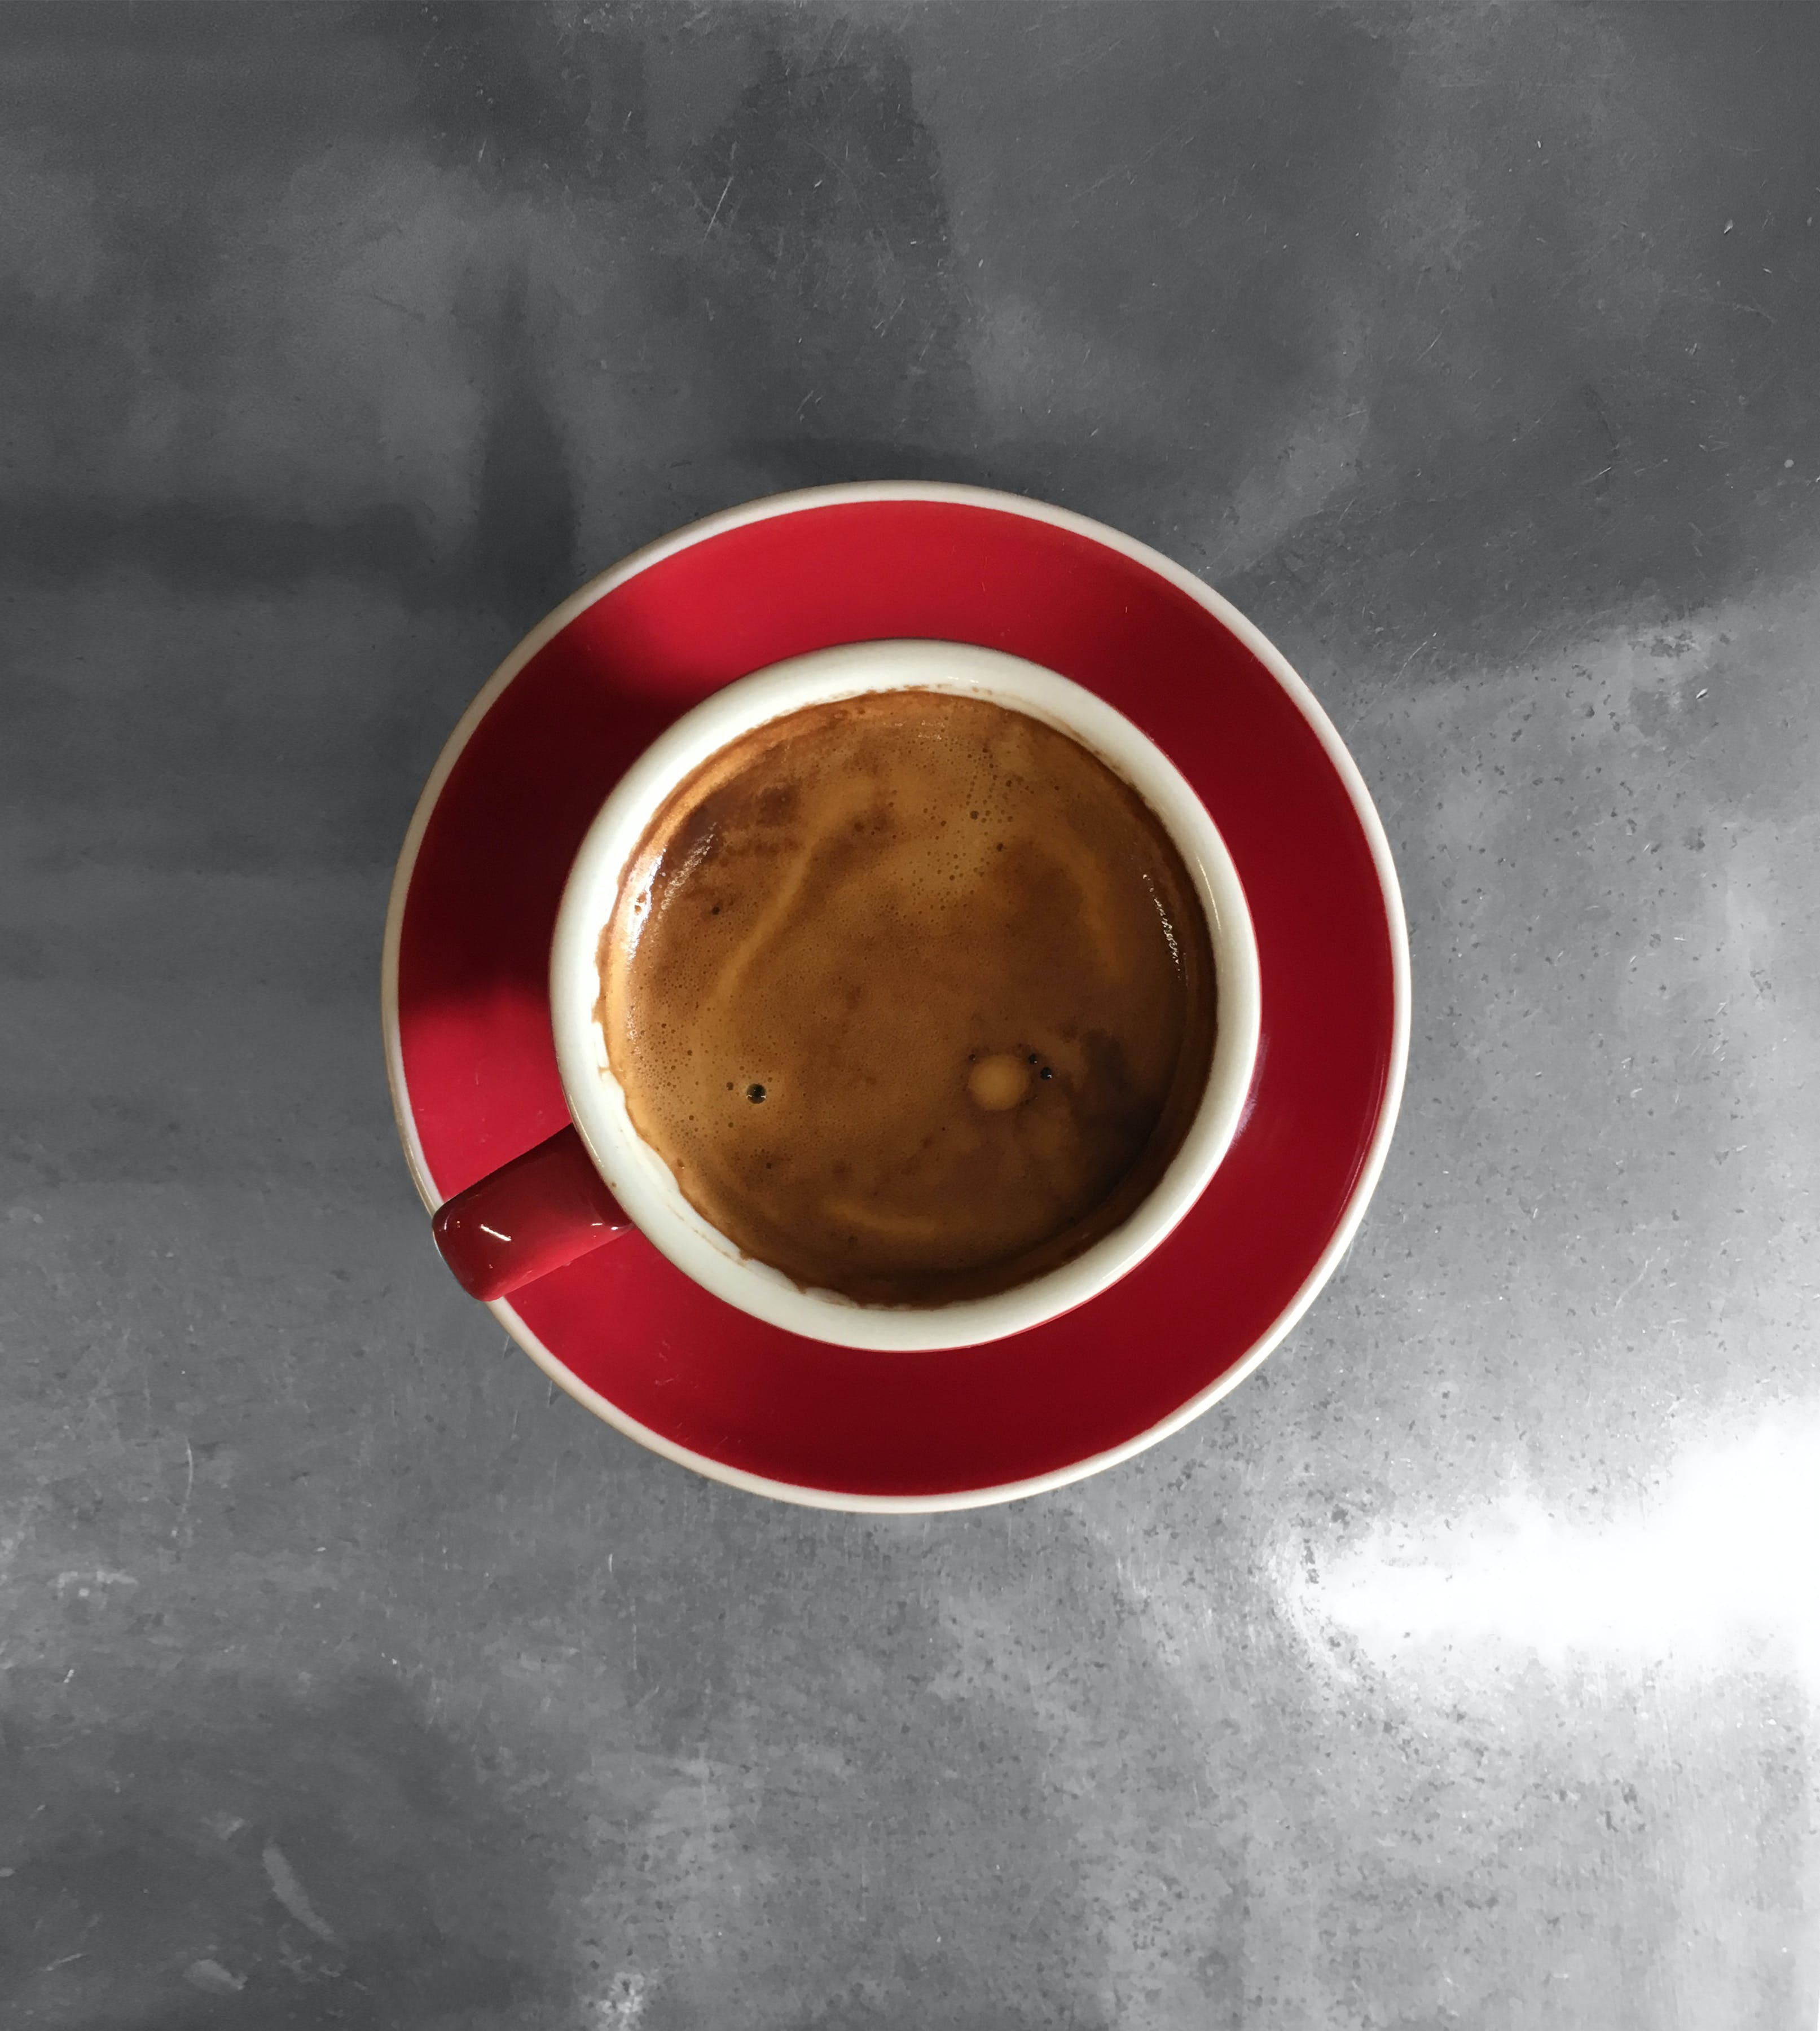 Free stock photo of barista, barista coffee, black coffee, café